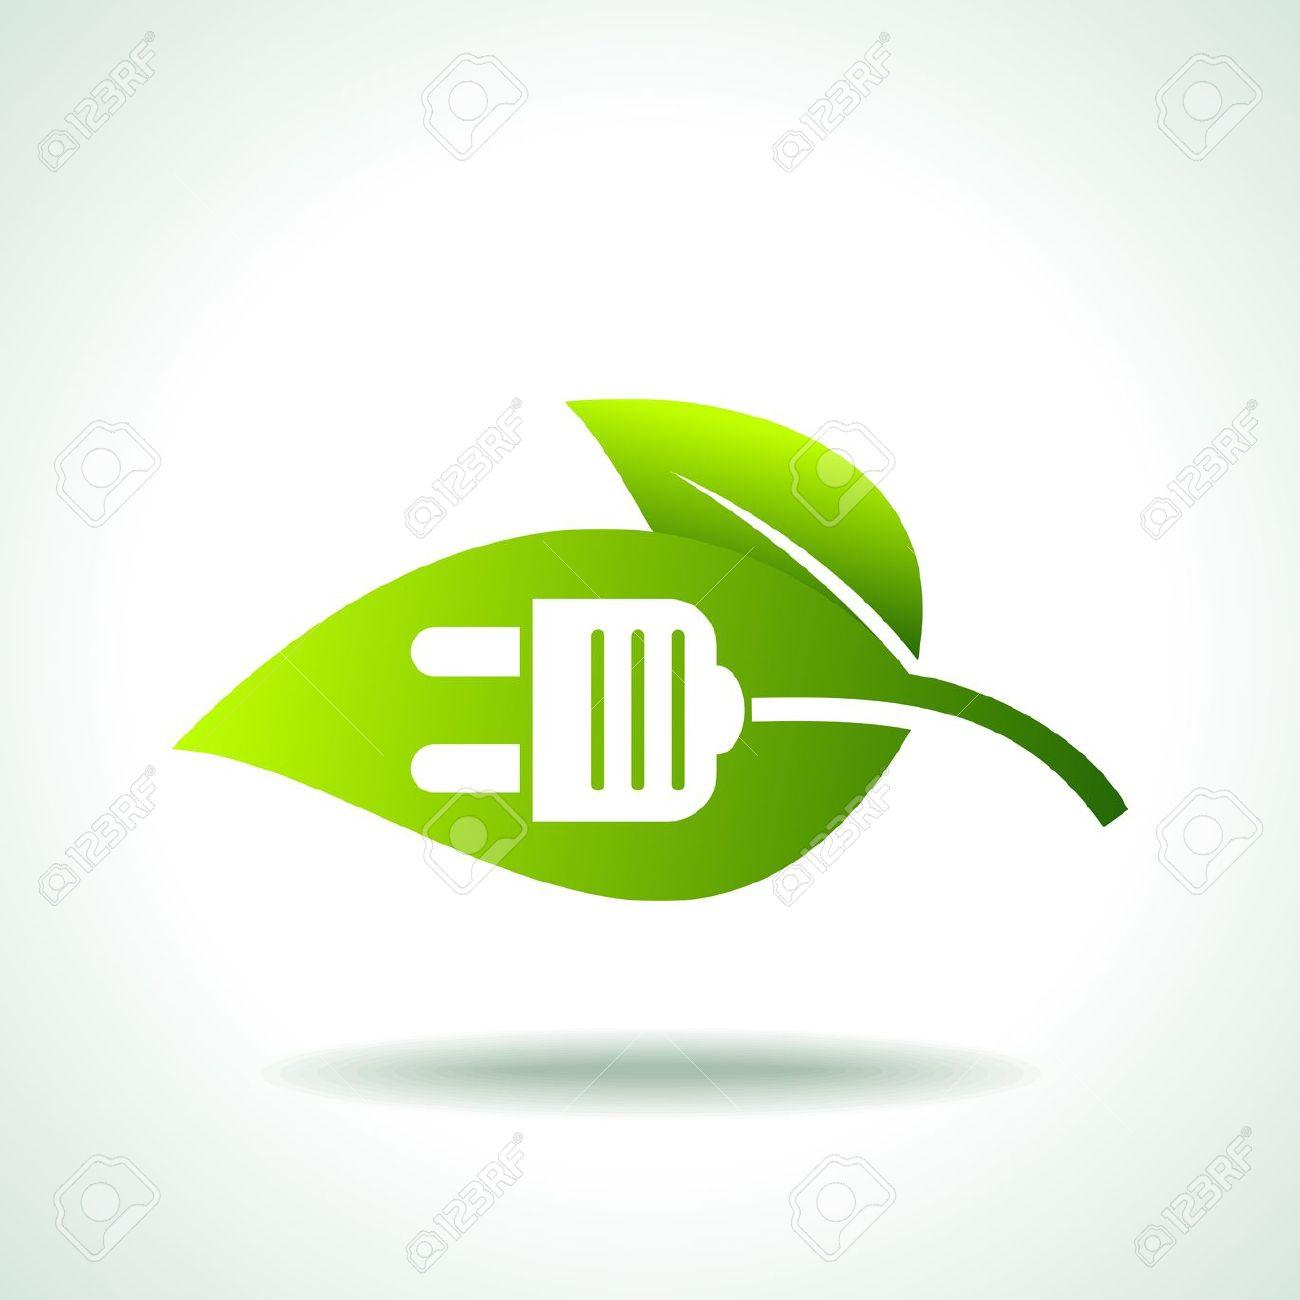 Energy efficiency clipart.